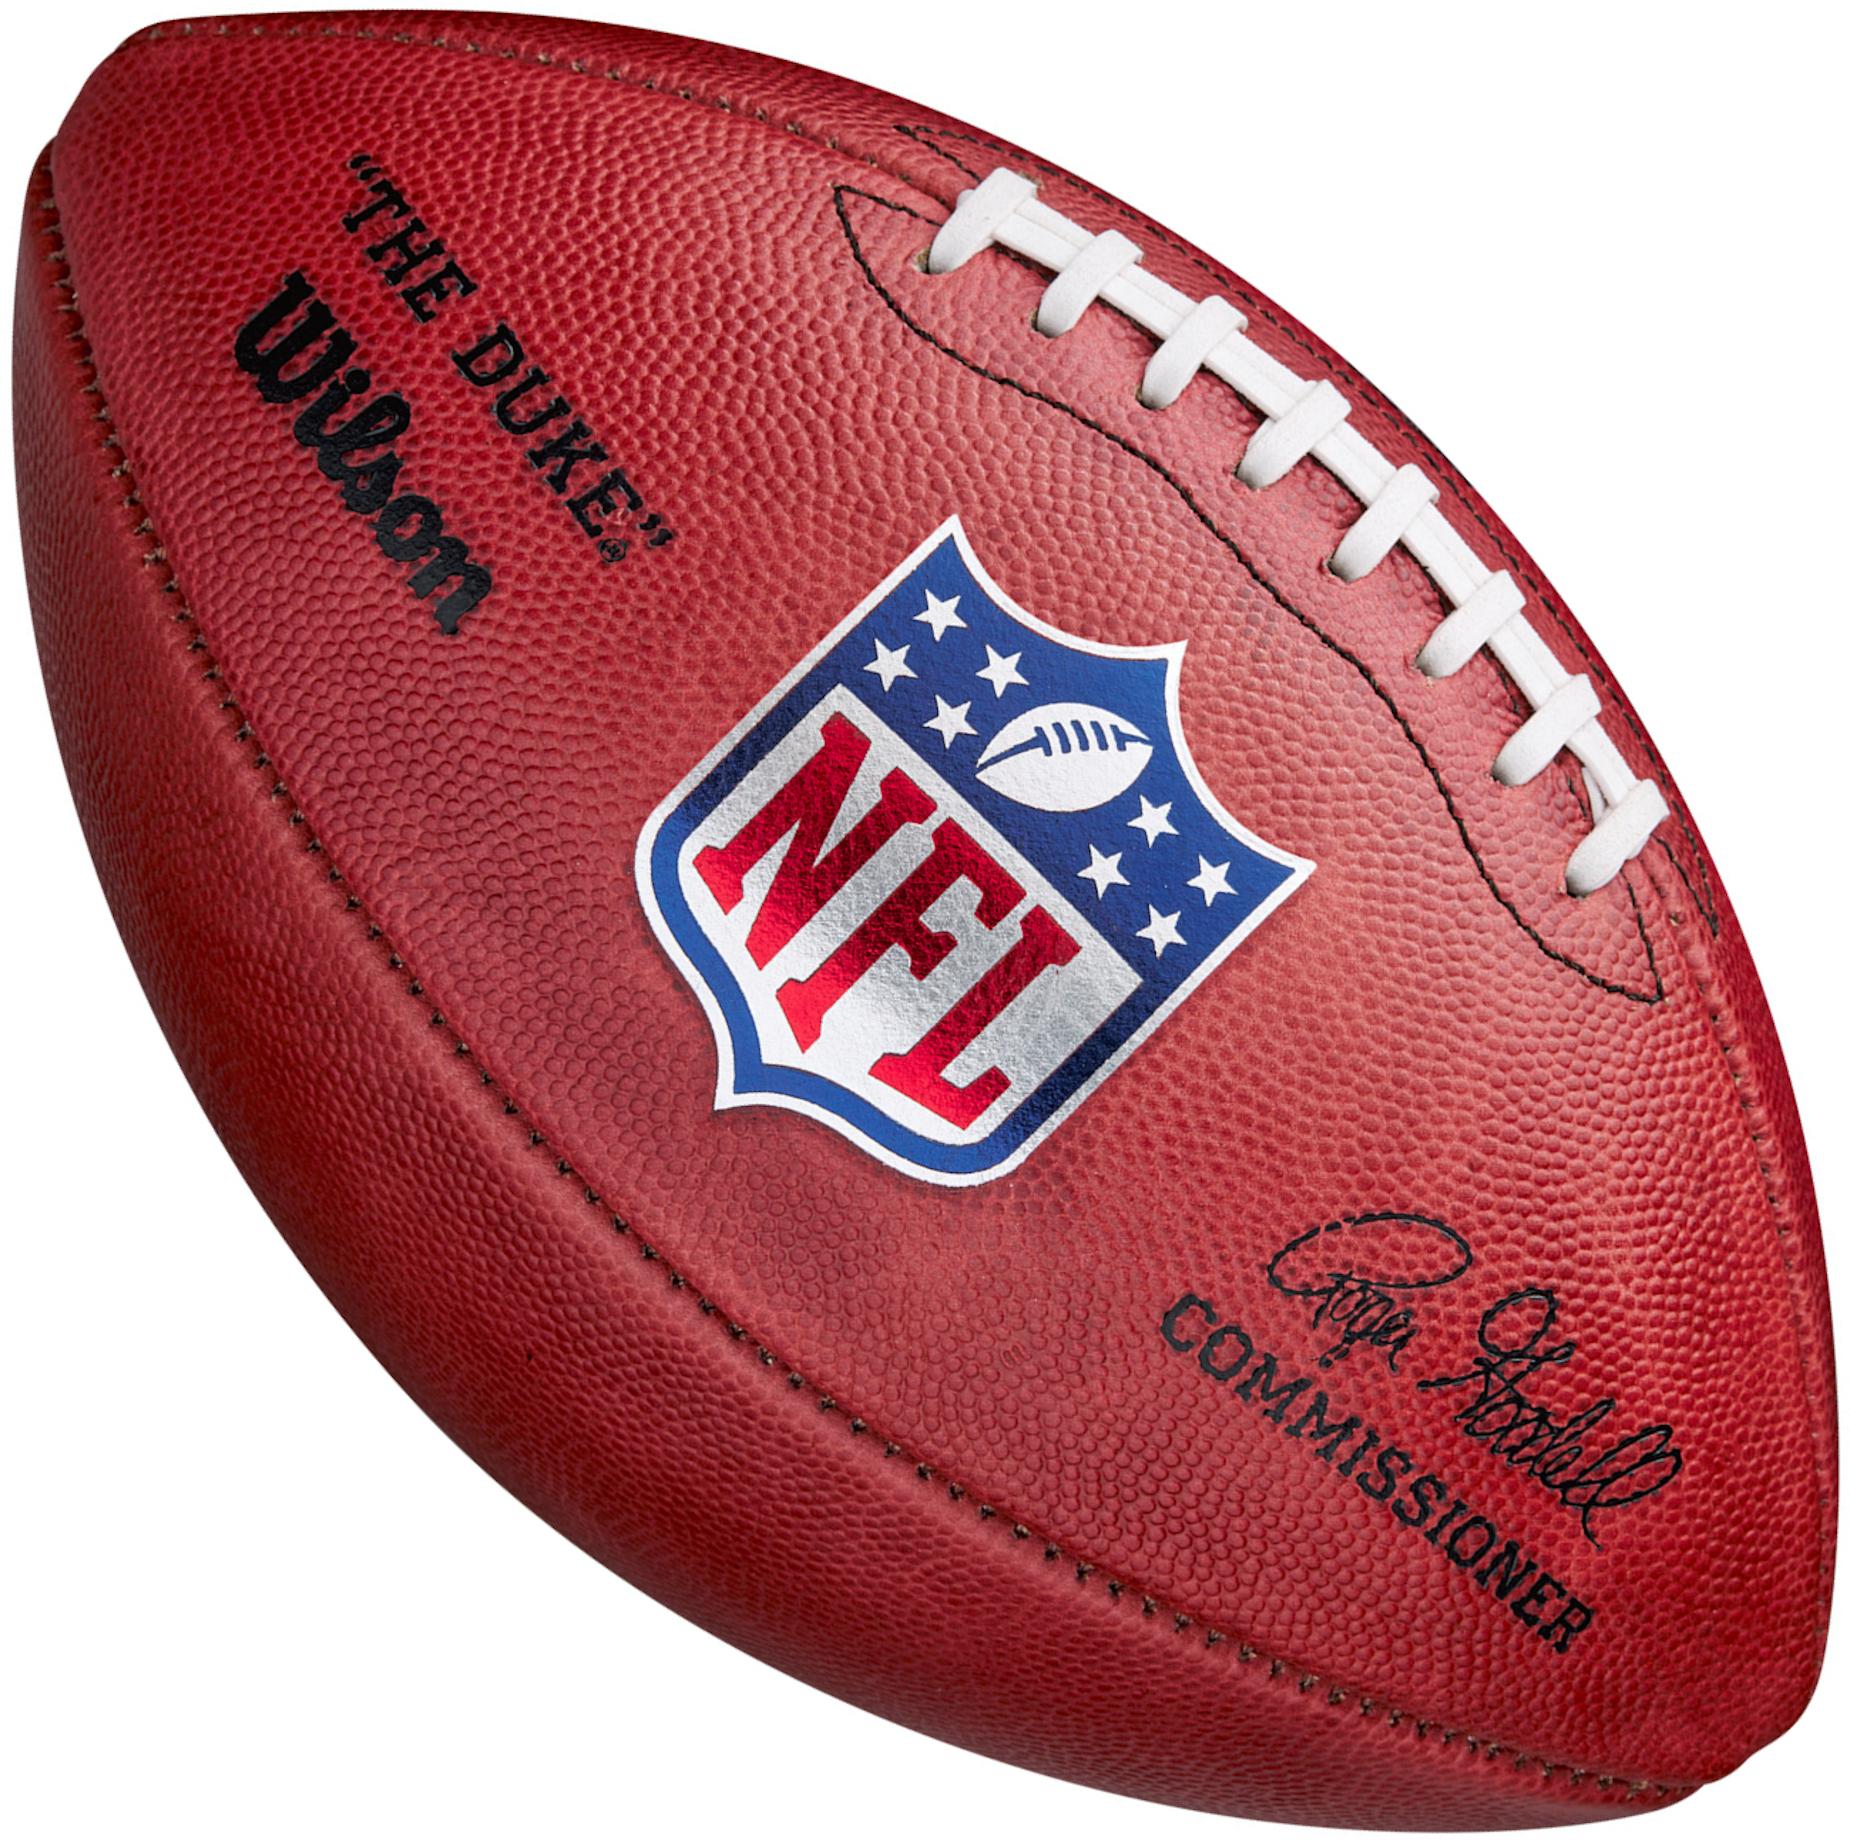 Wilson Official NFL Game Football Goodell <B>NEW 2020</B>